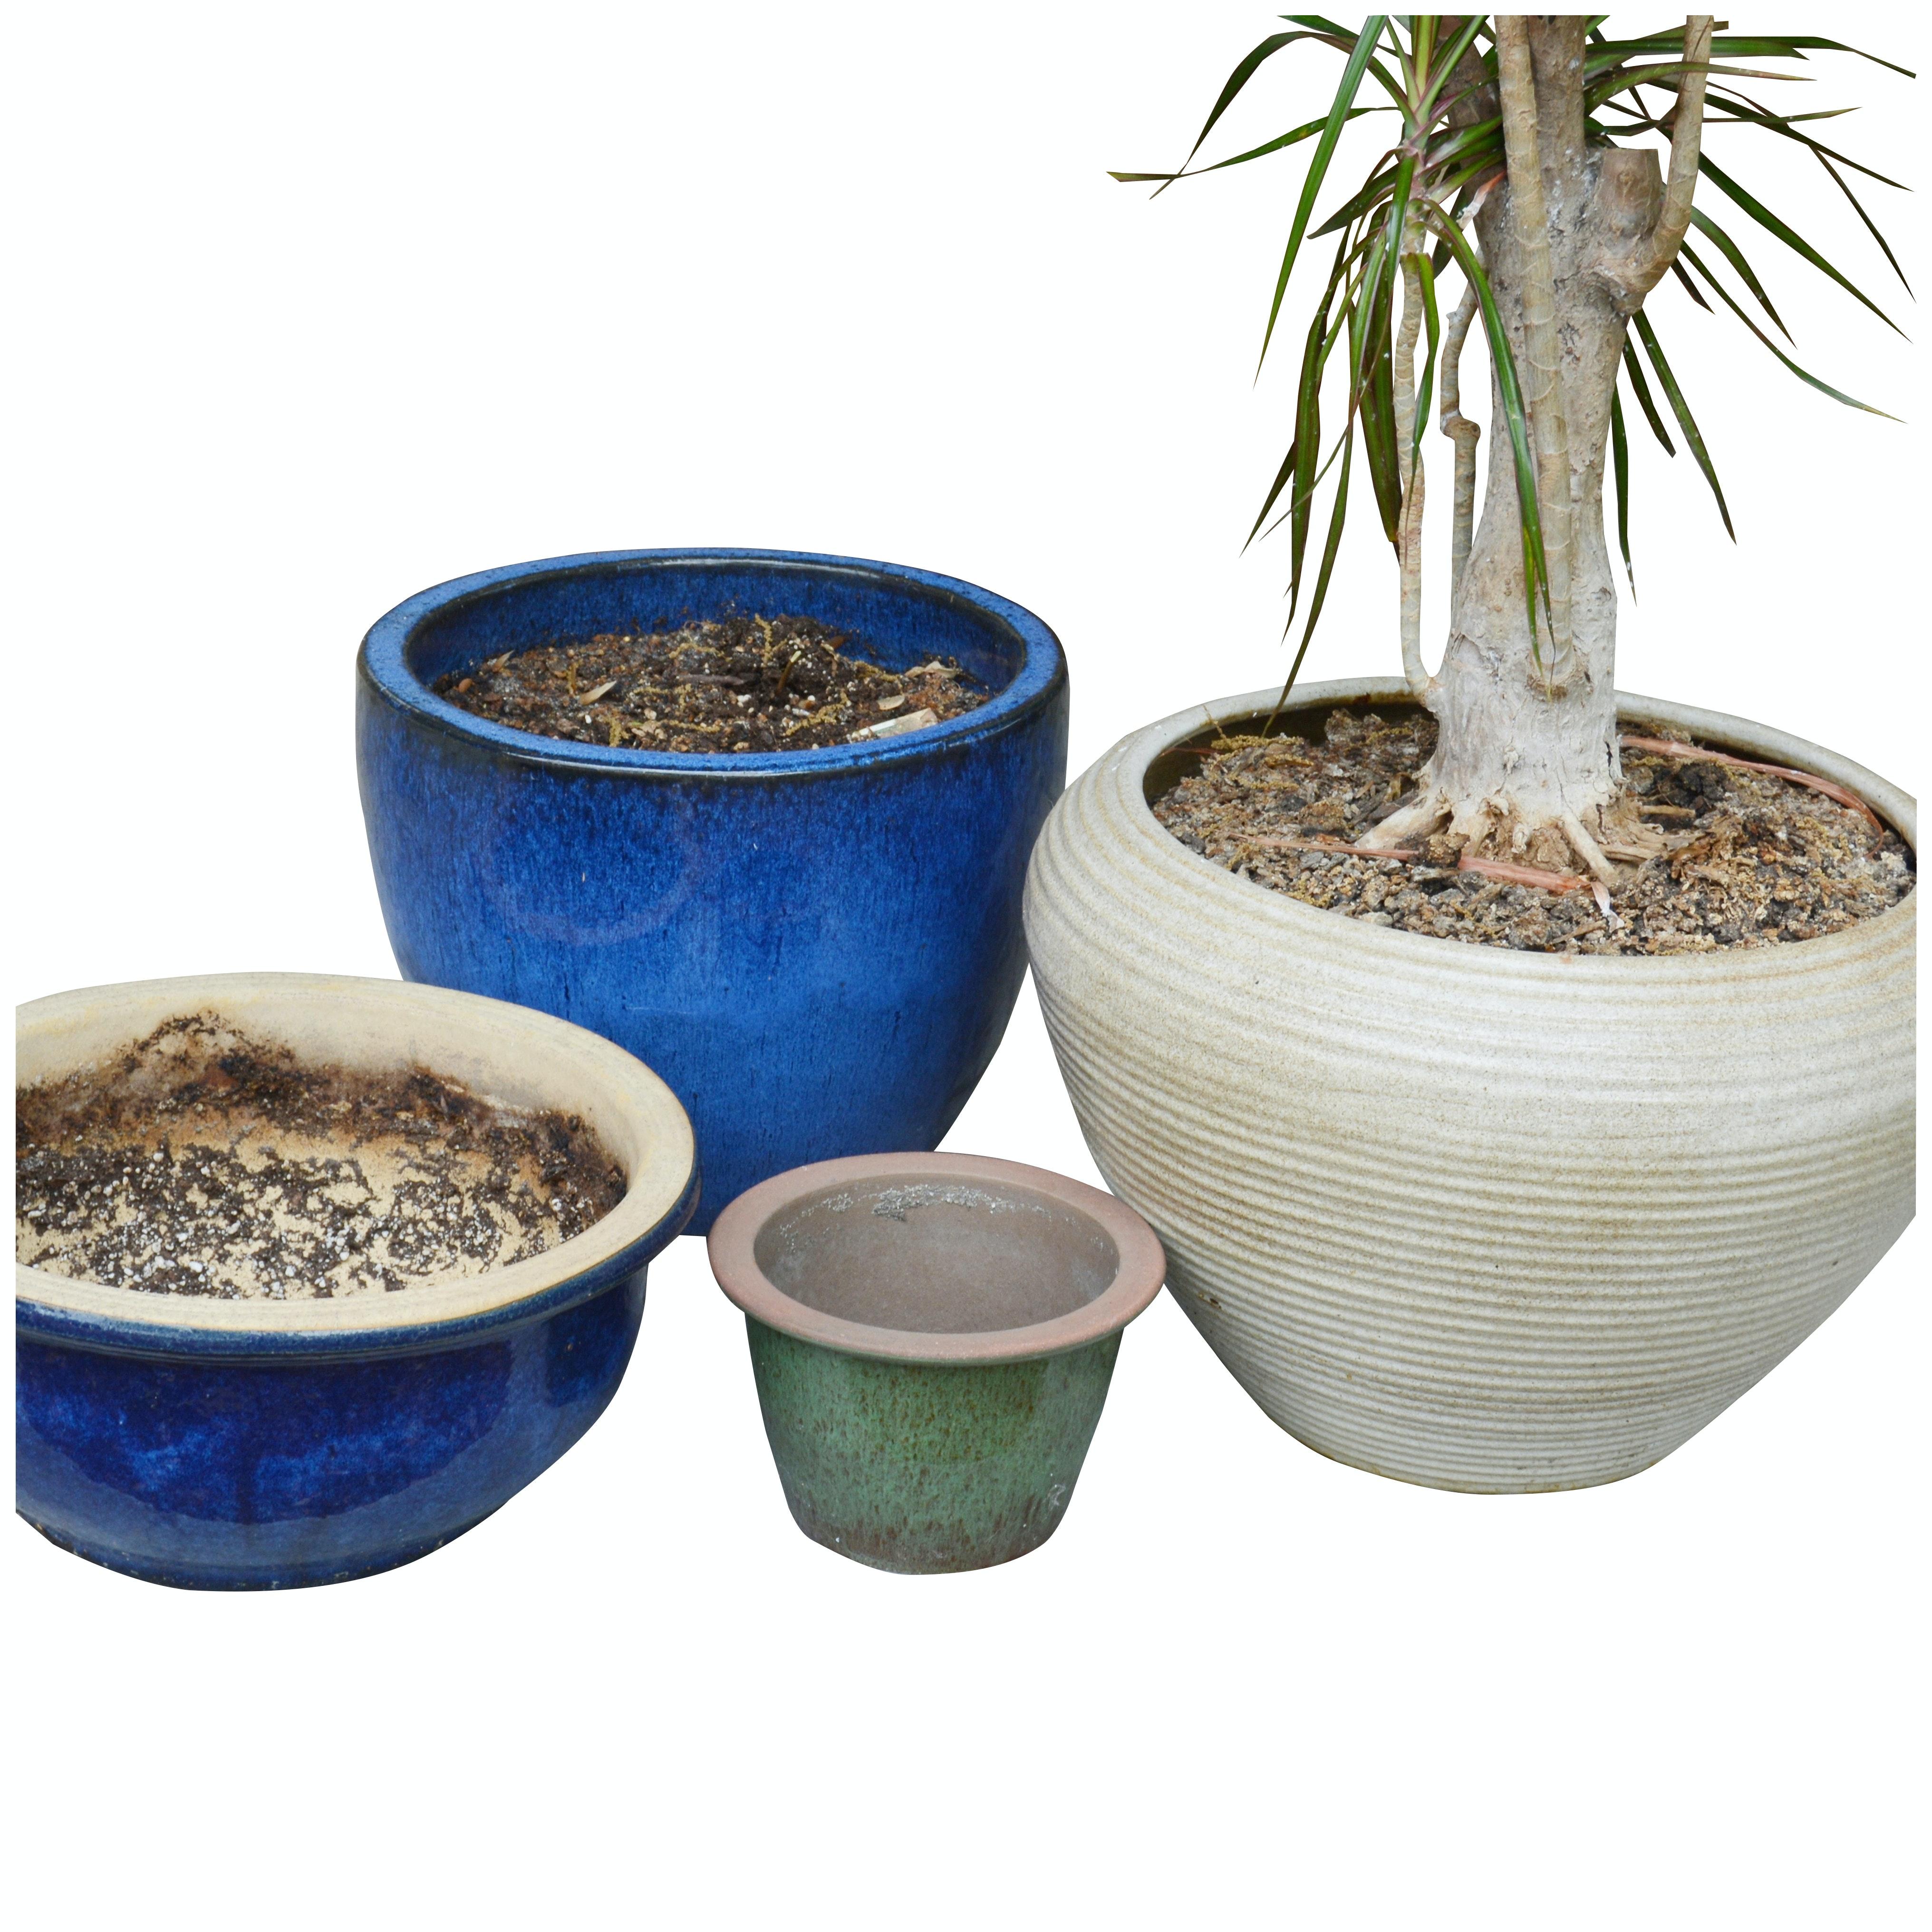 Live Palm Tree and Ceramic Planters